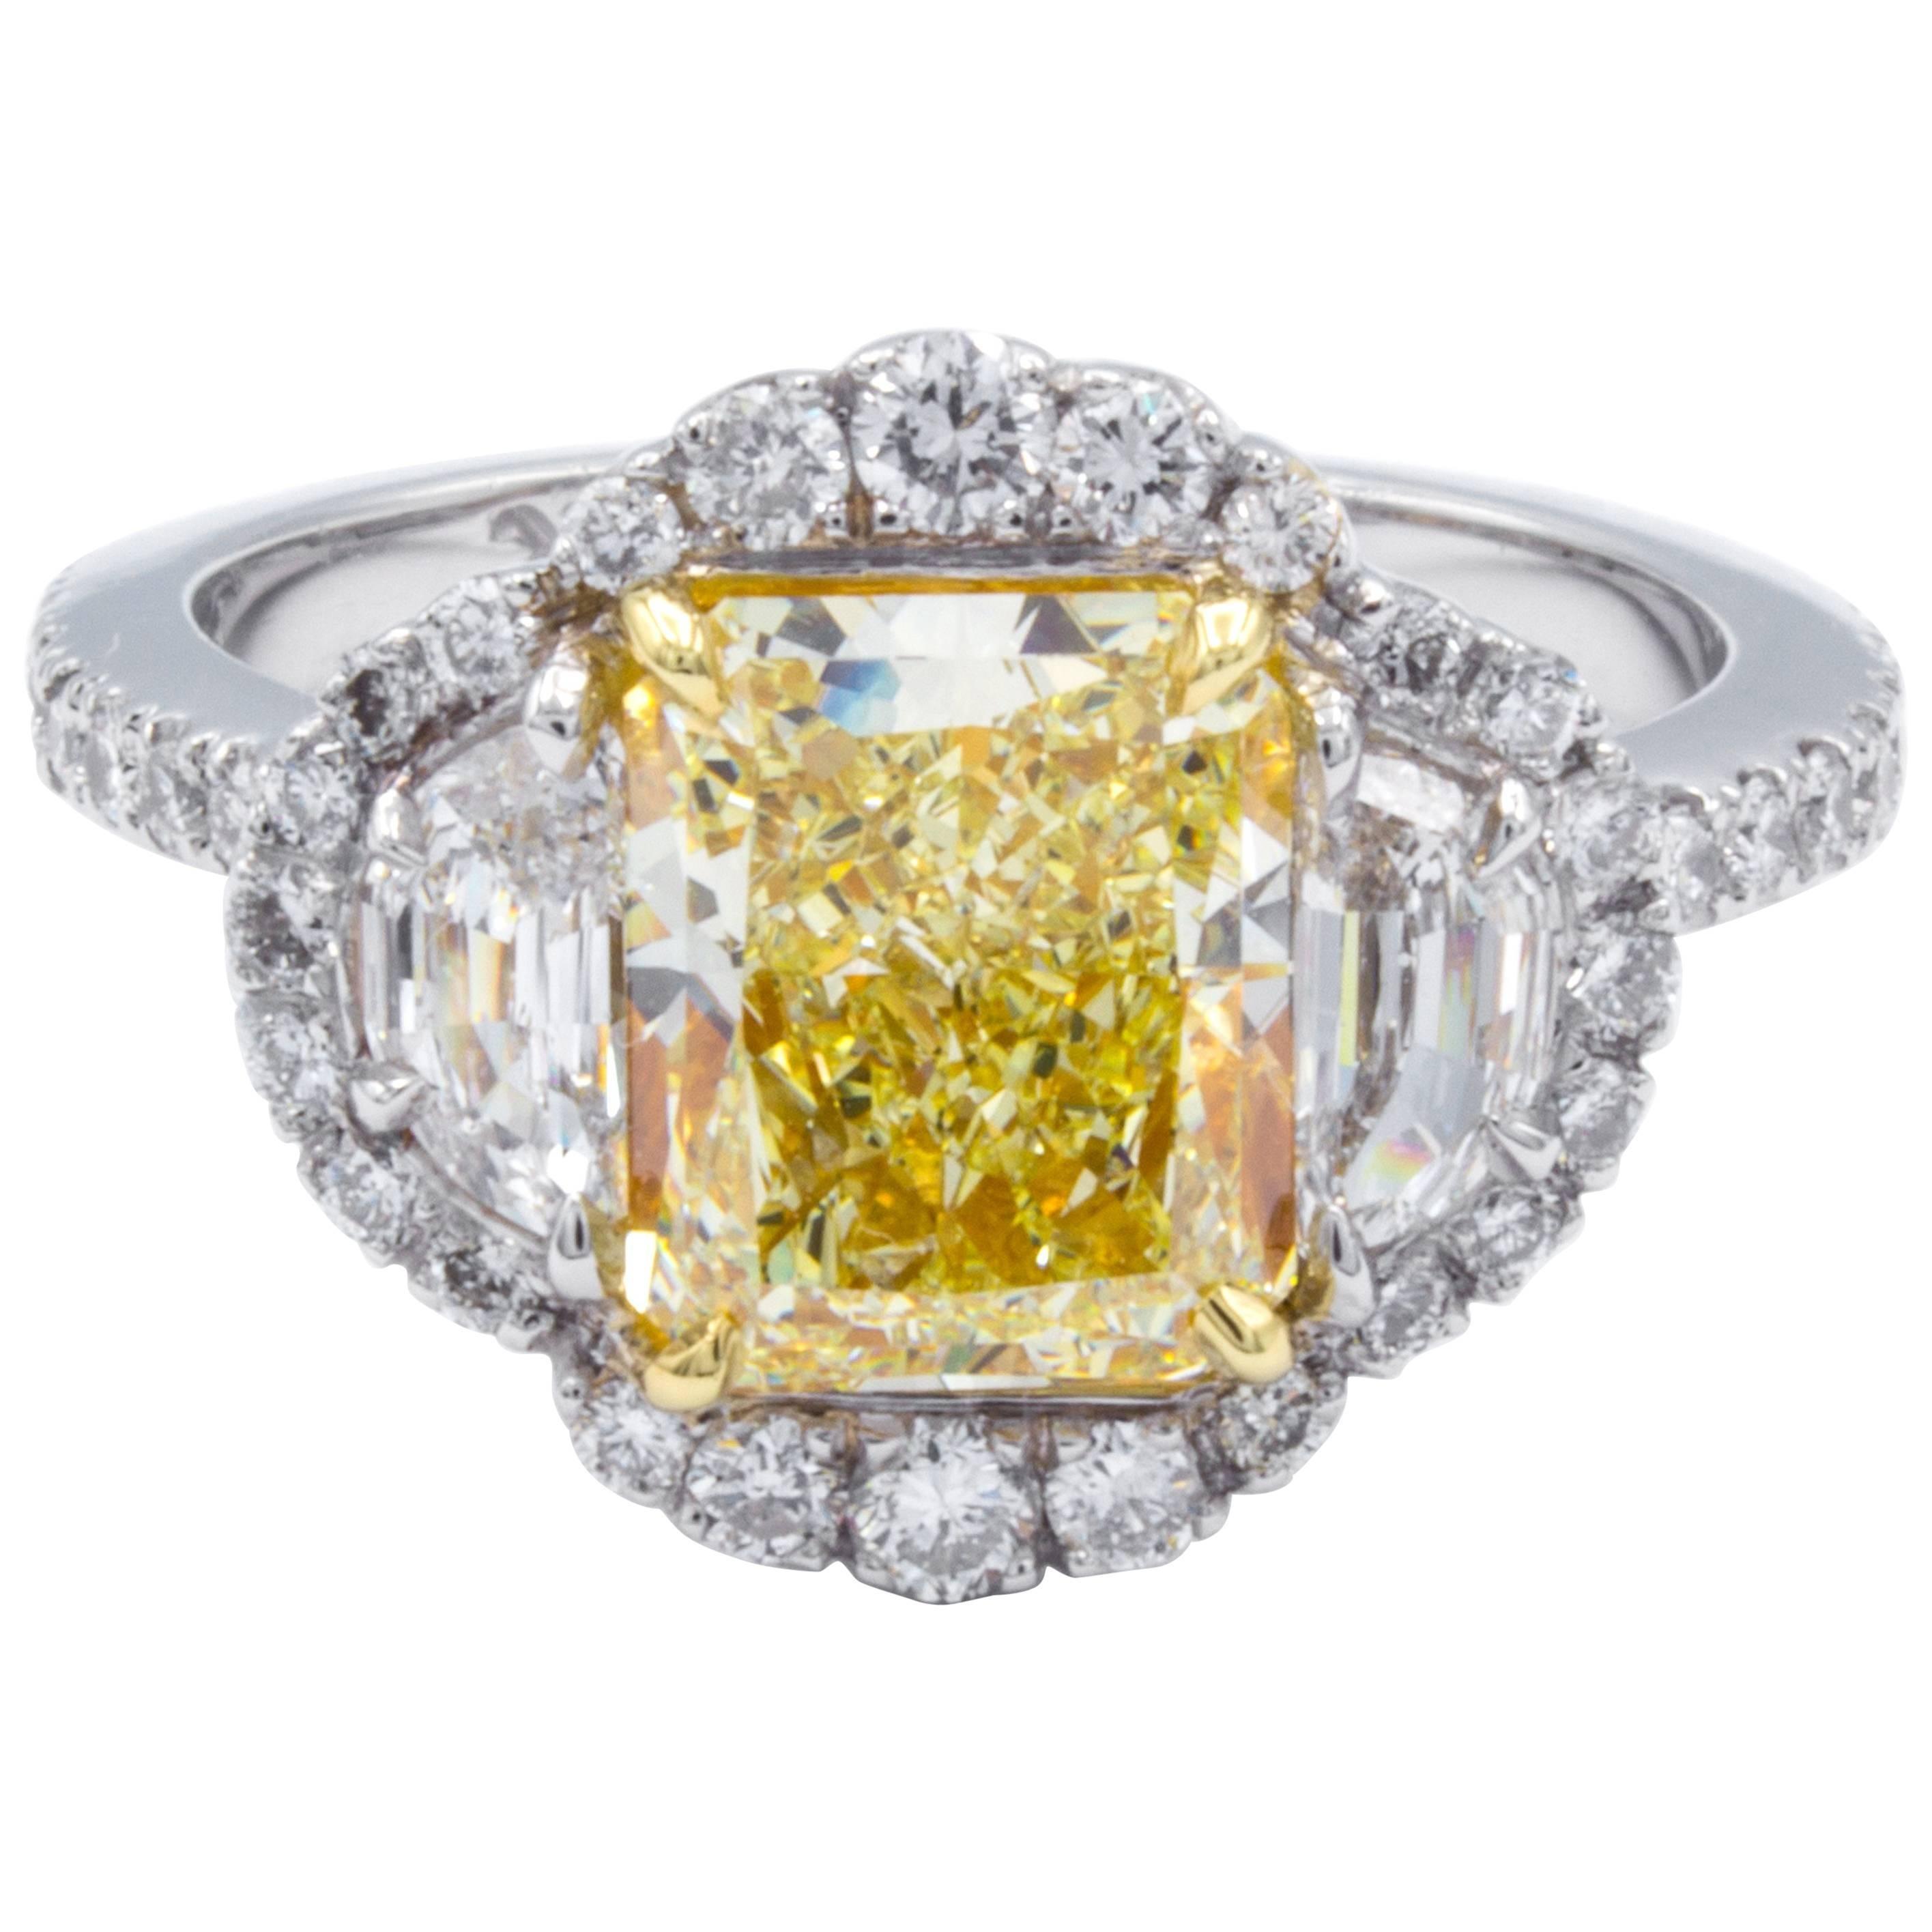 David Rosenberg 2.14 Carat Radiant Fancy Yellow VS GIA Diamond Engagement Ring